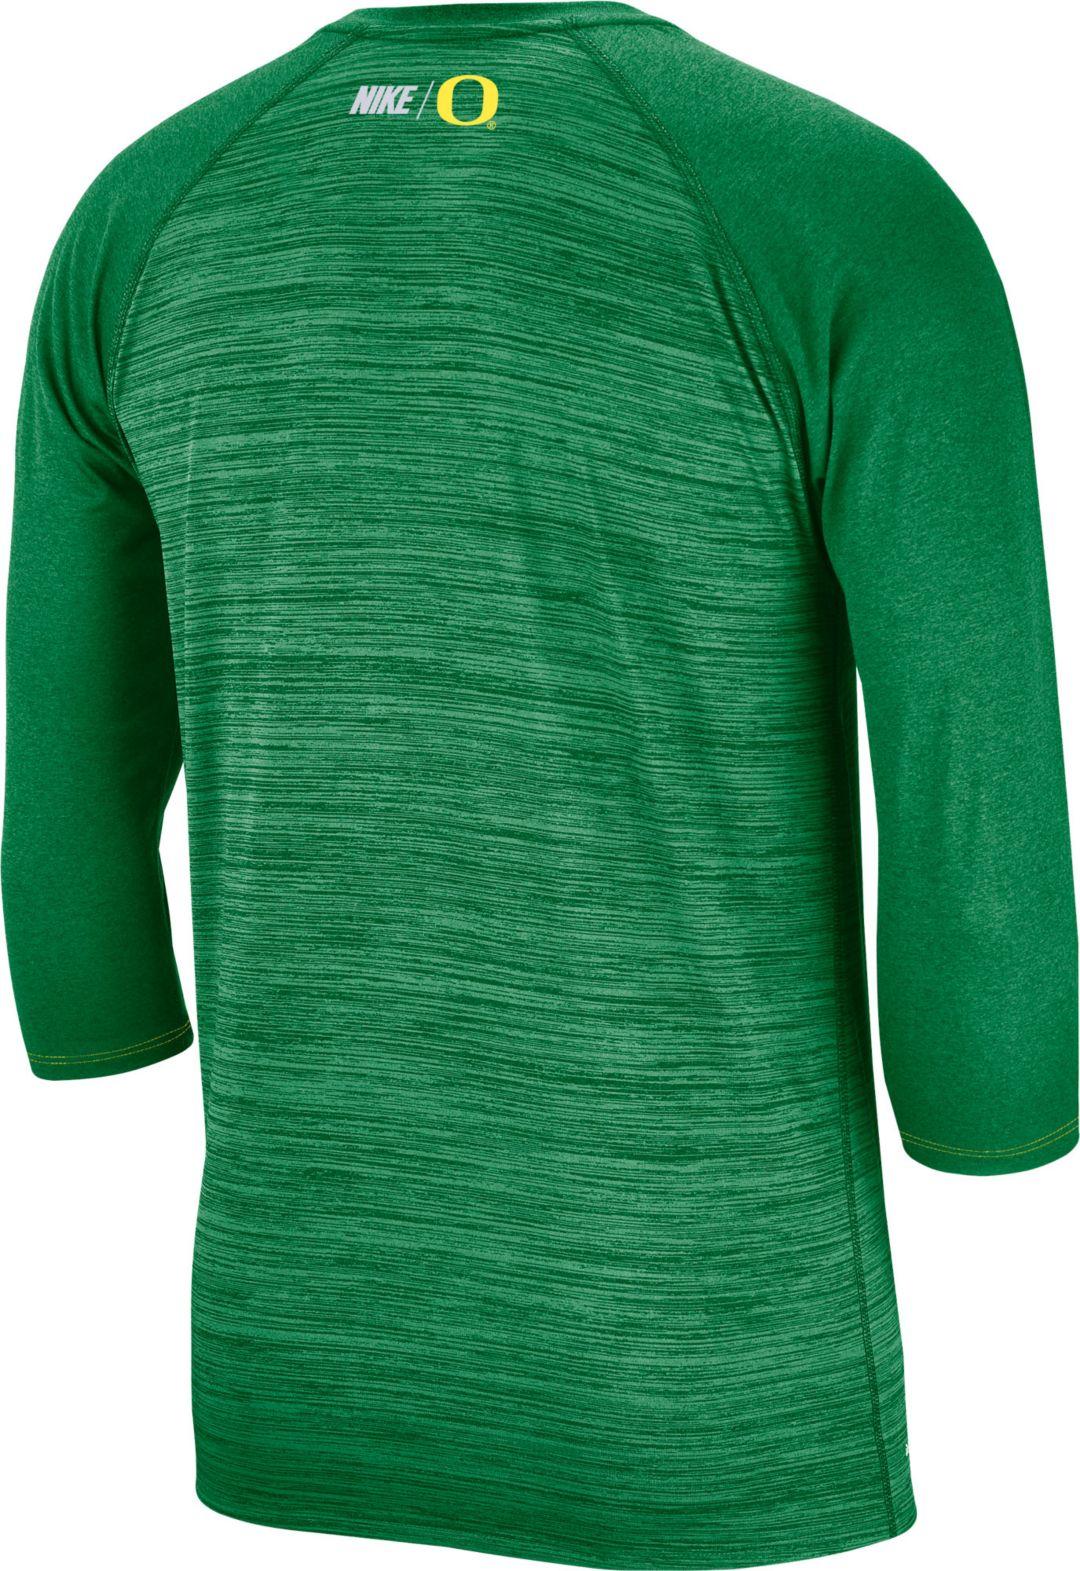 44a92258 Nike Men's Oregon Ducks Green Dry Legend 3/4 Sleeve T-Shirt